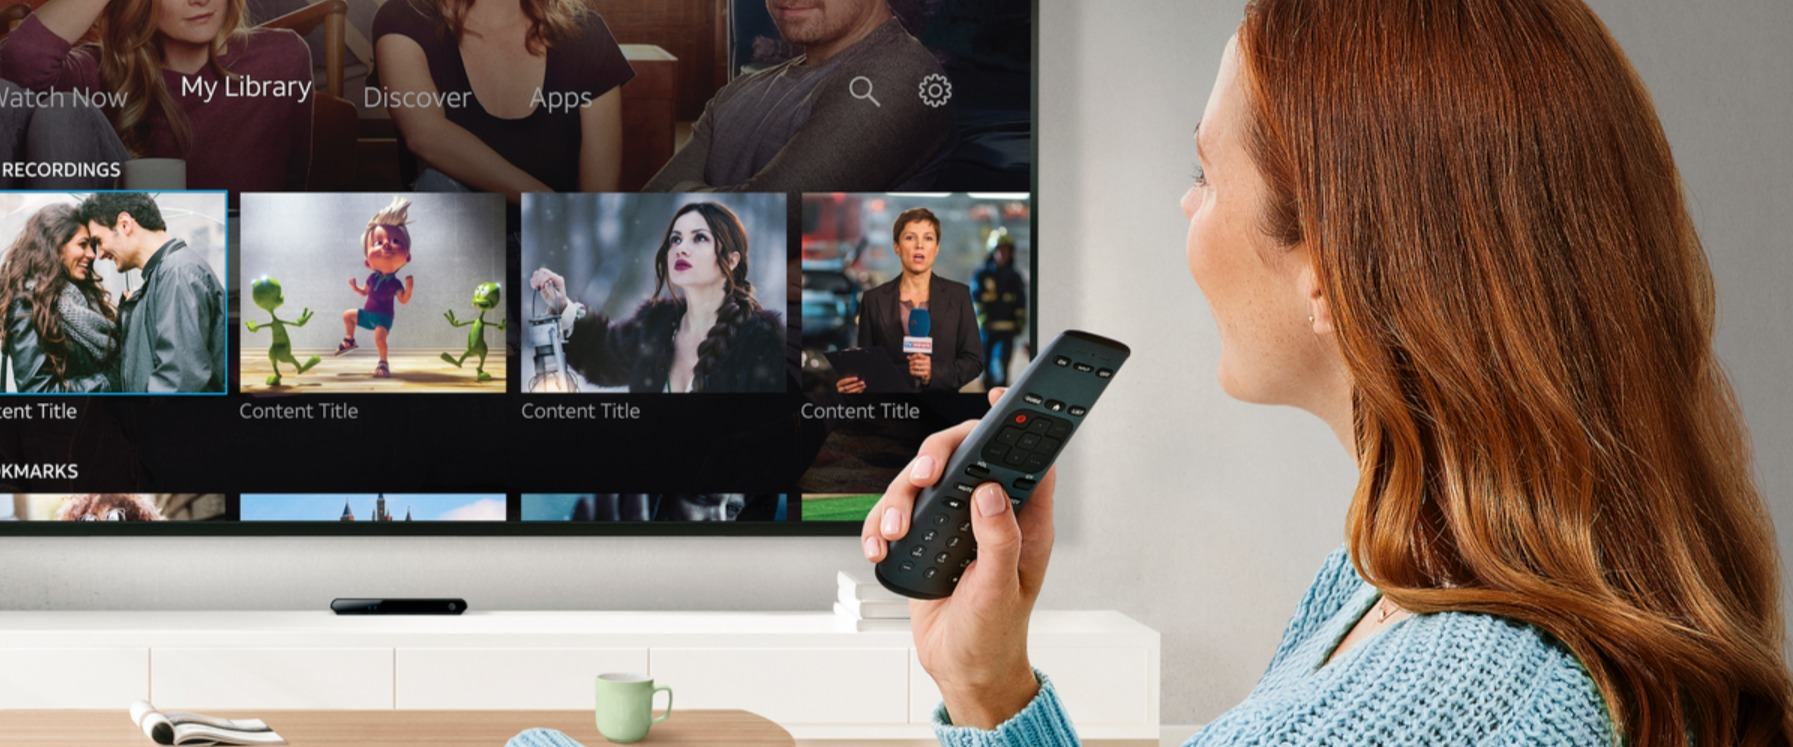 Kostenlose Tv App Android